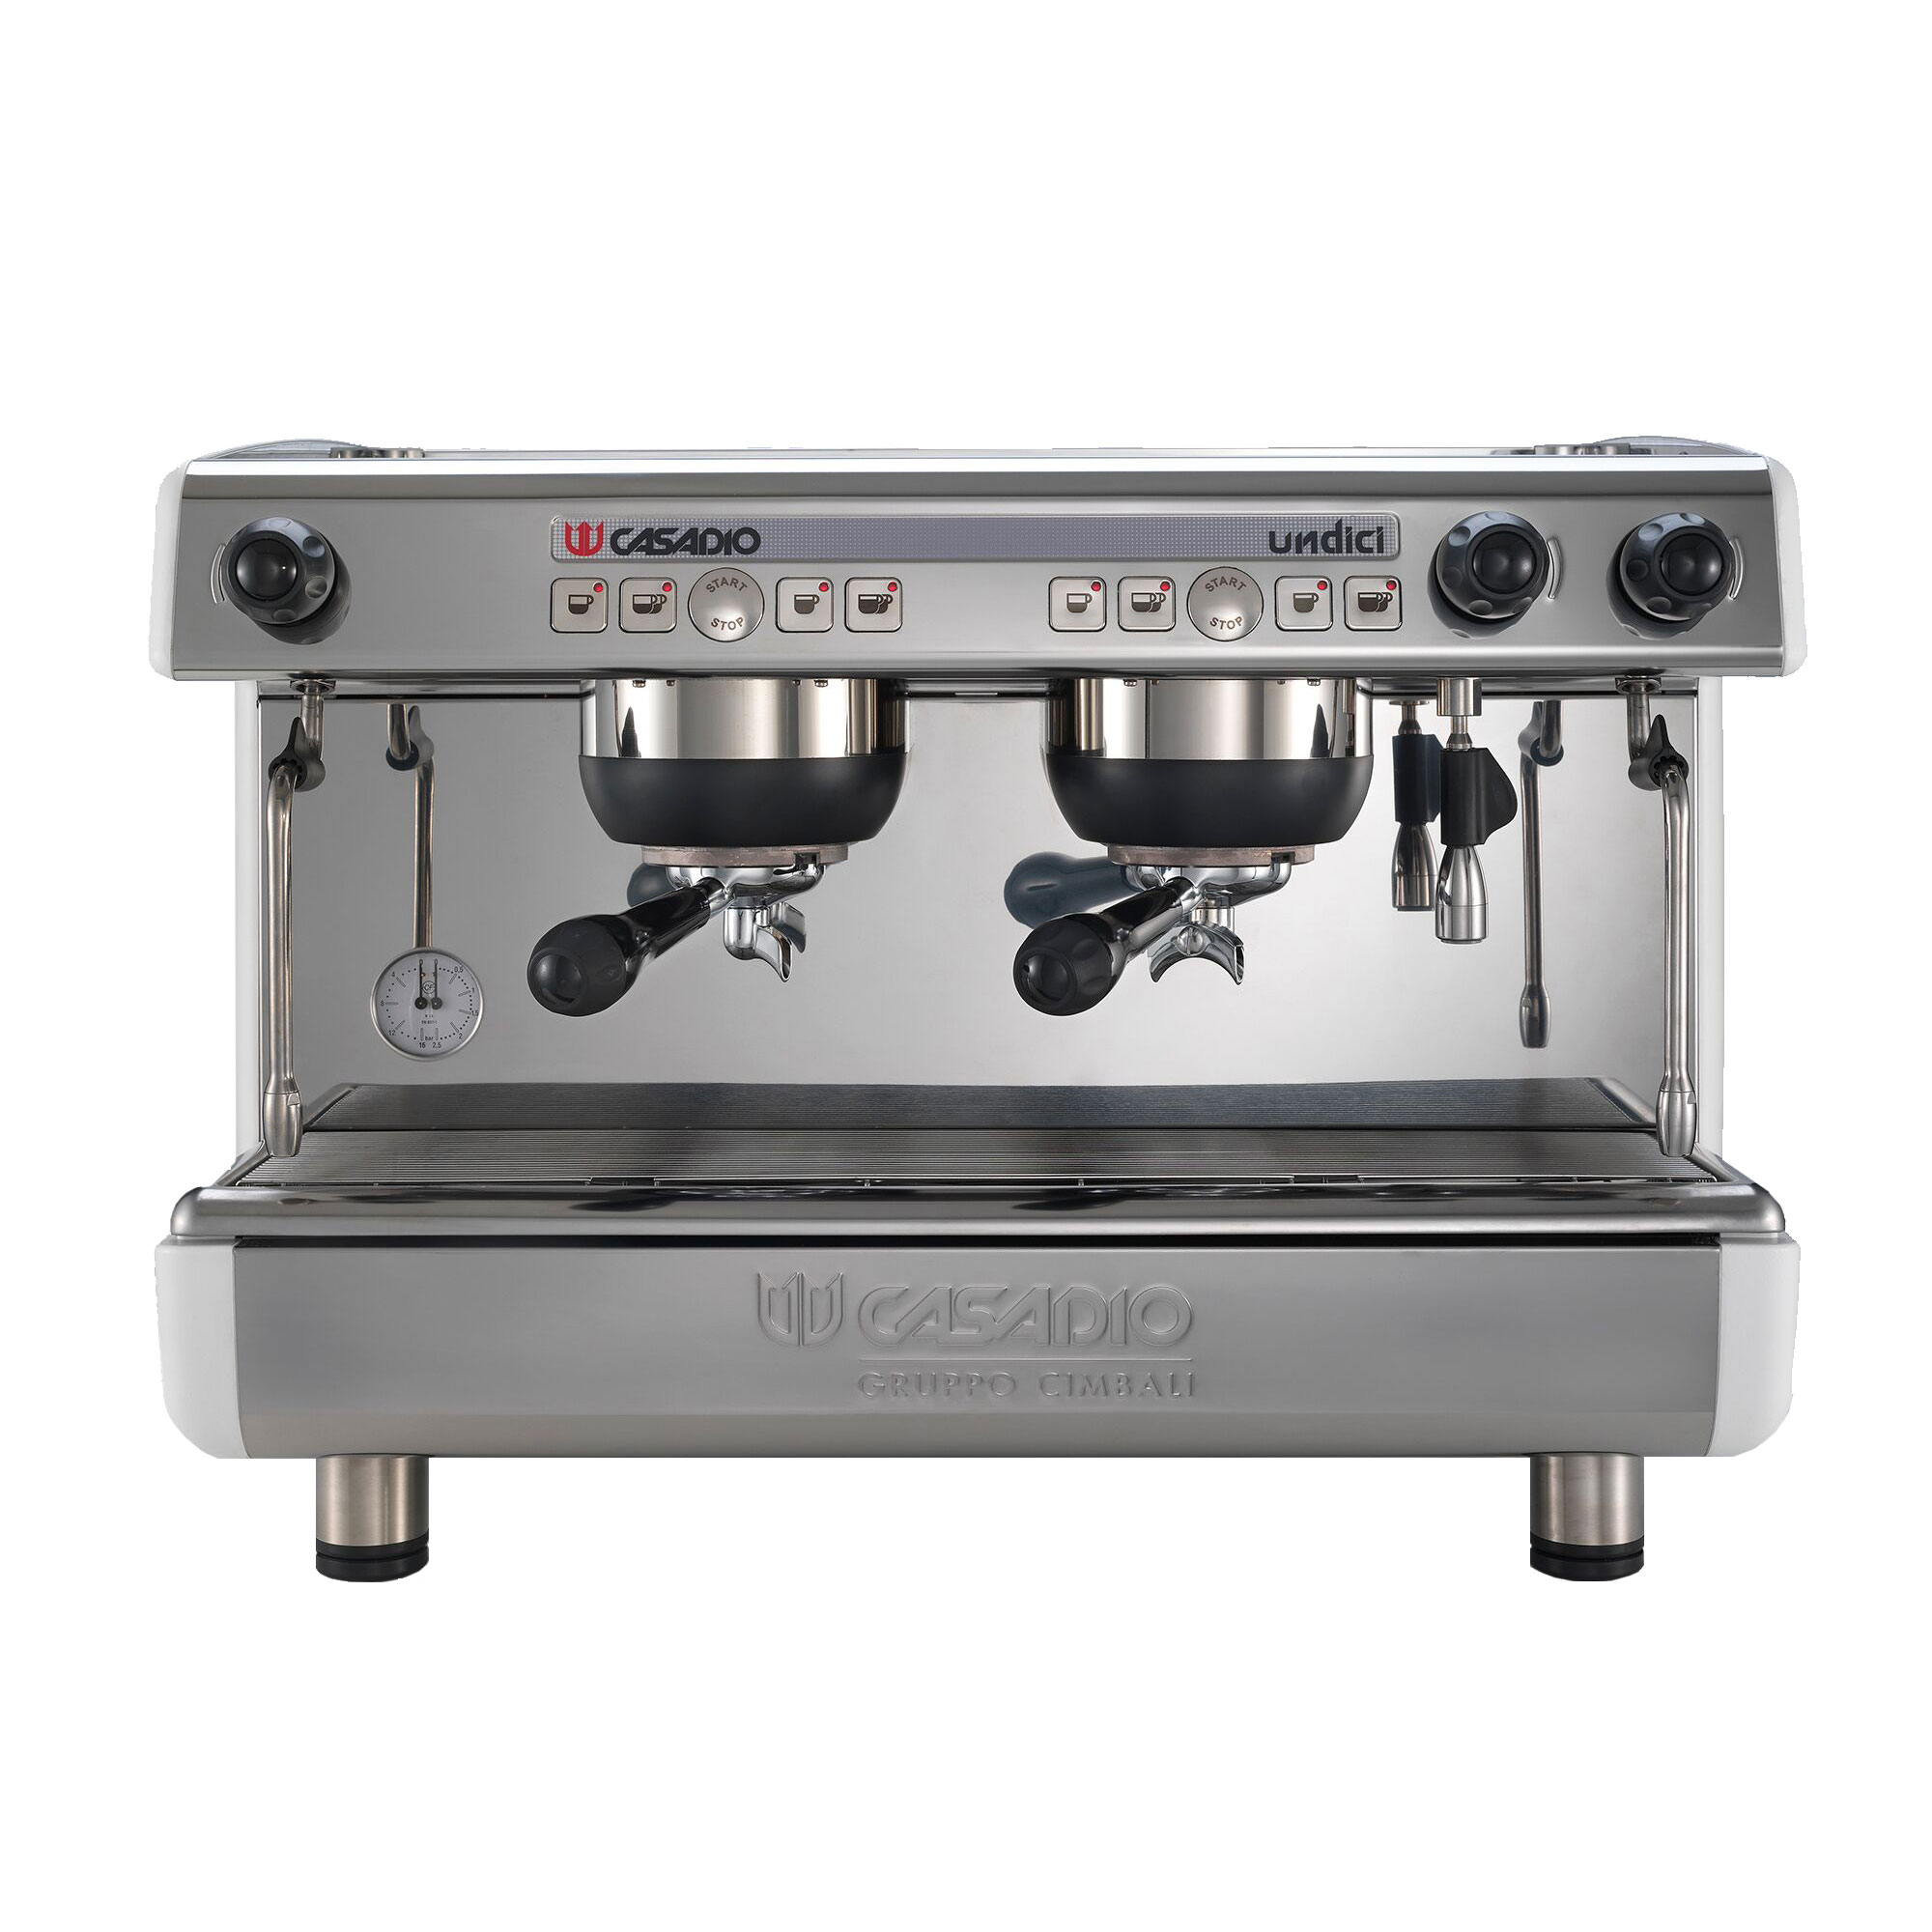 Cimbali Undici Espresso Machine